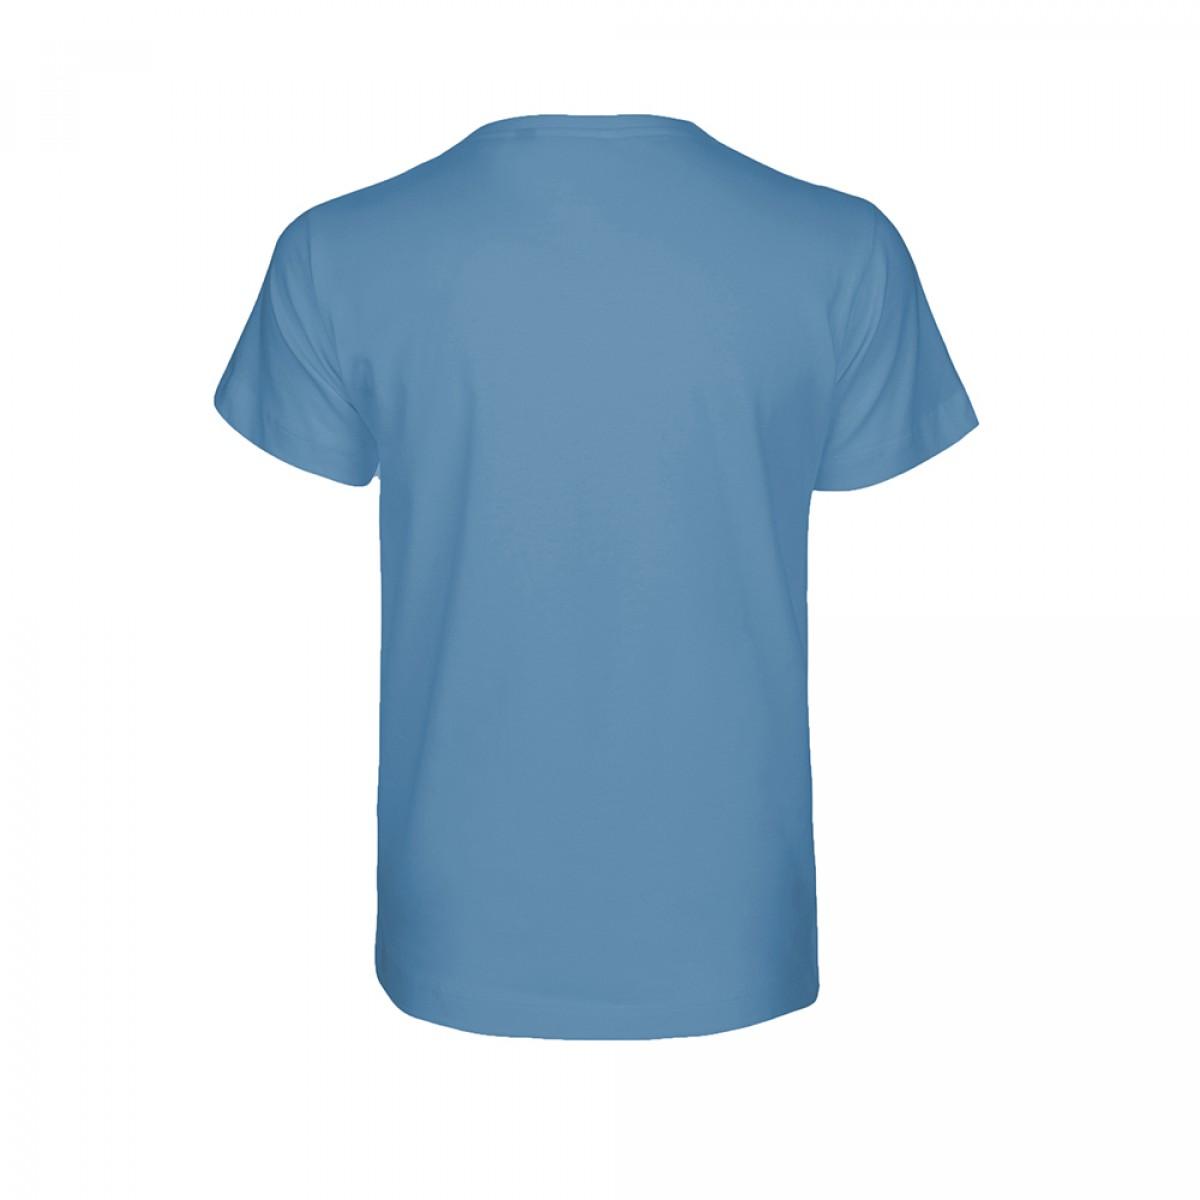 "Rapü Design Kindershirt ""Stinker"" | Fair Trade"